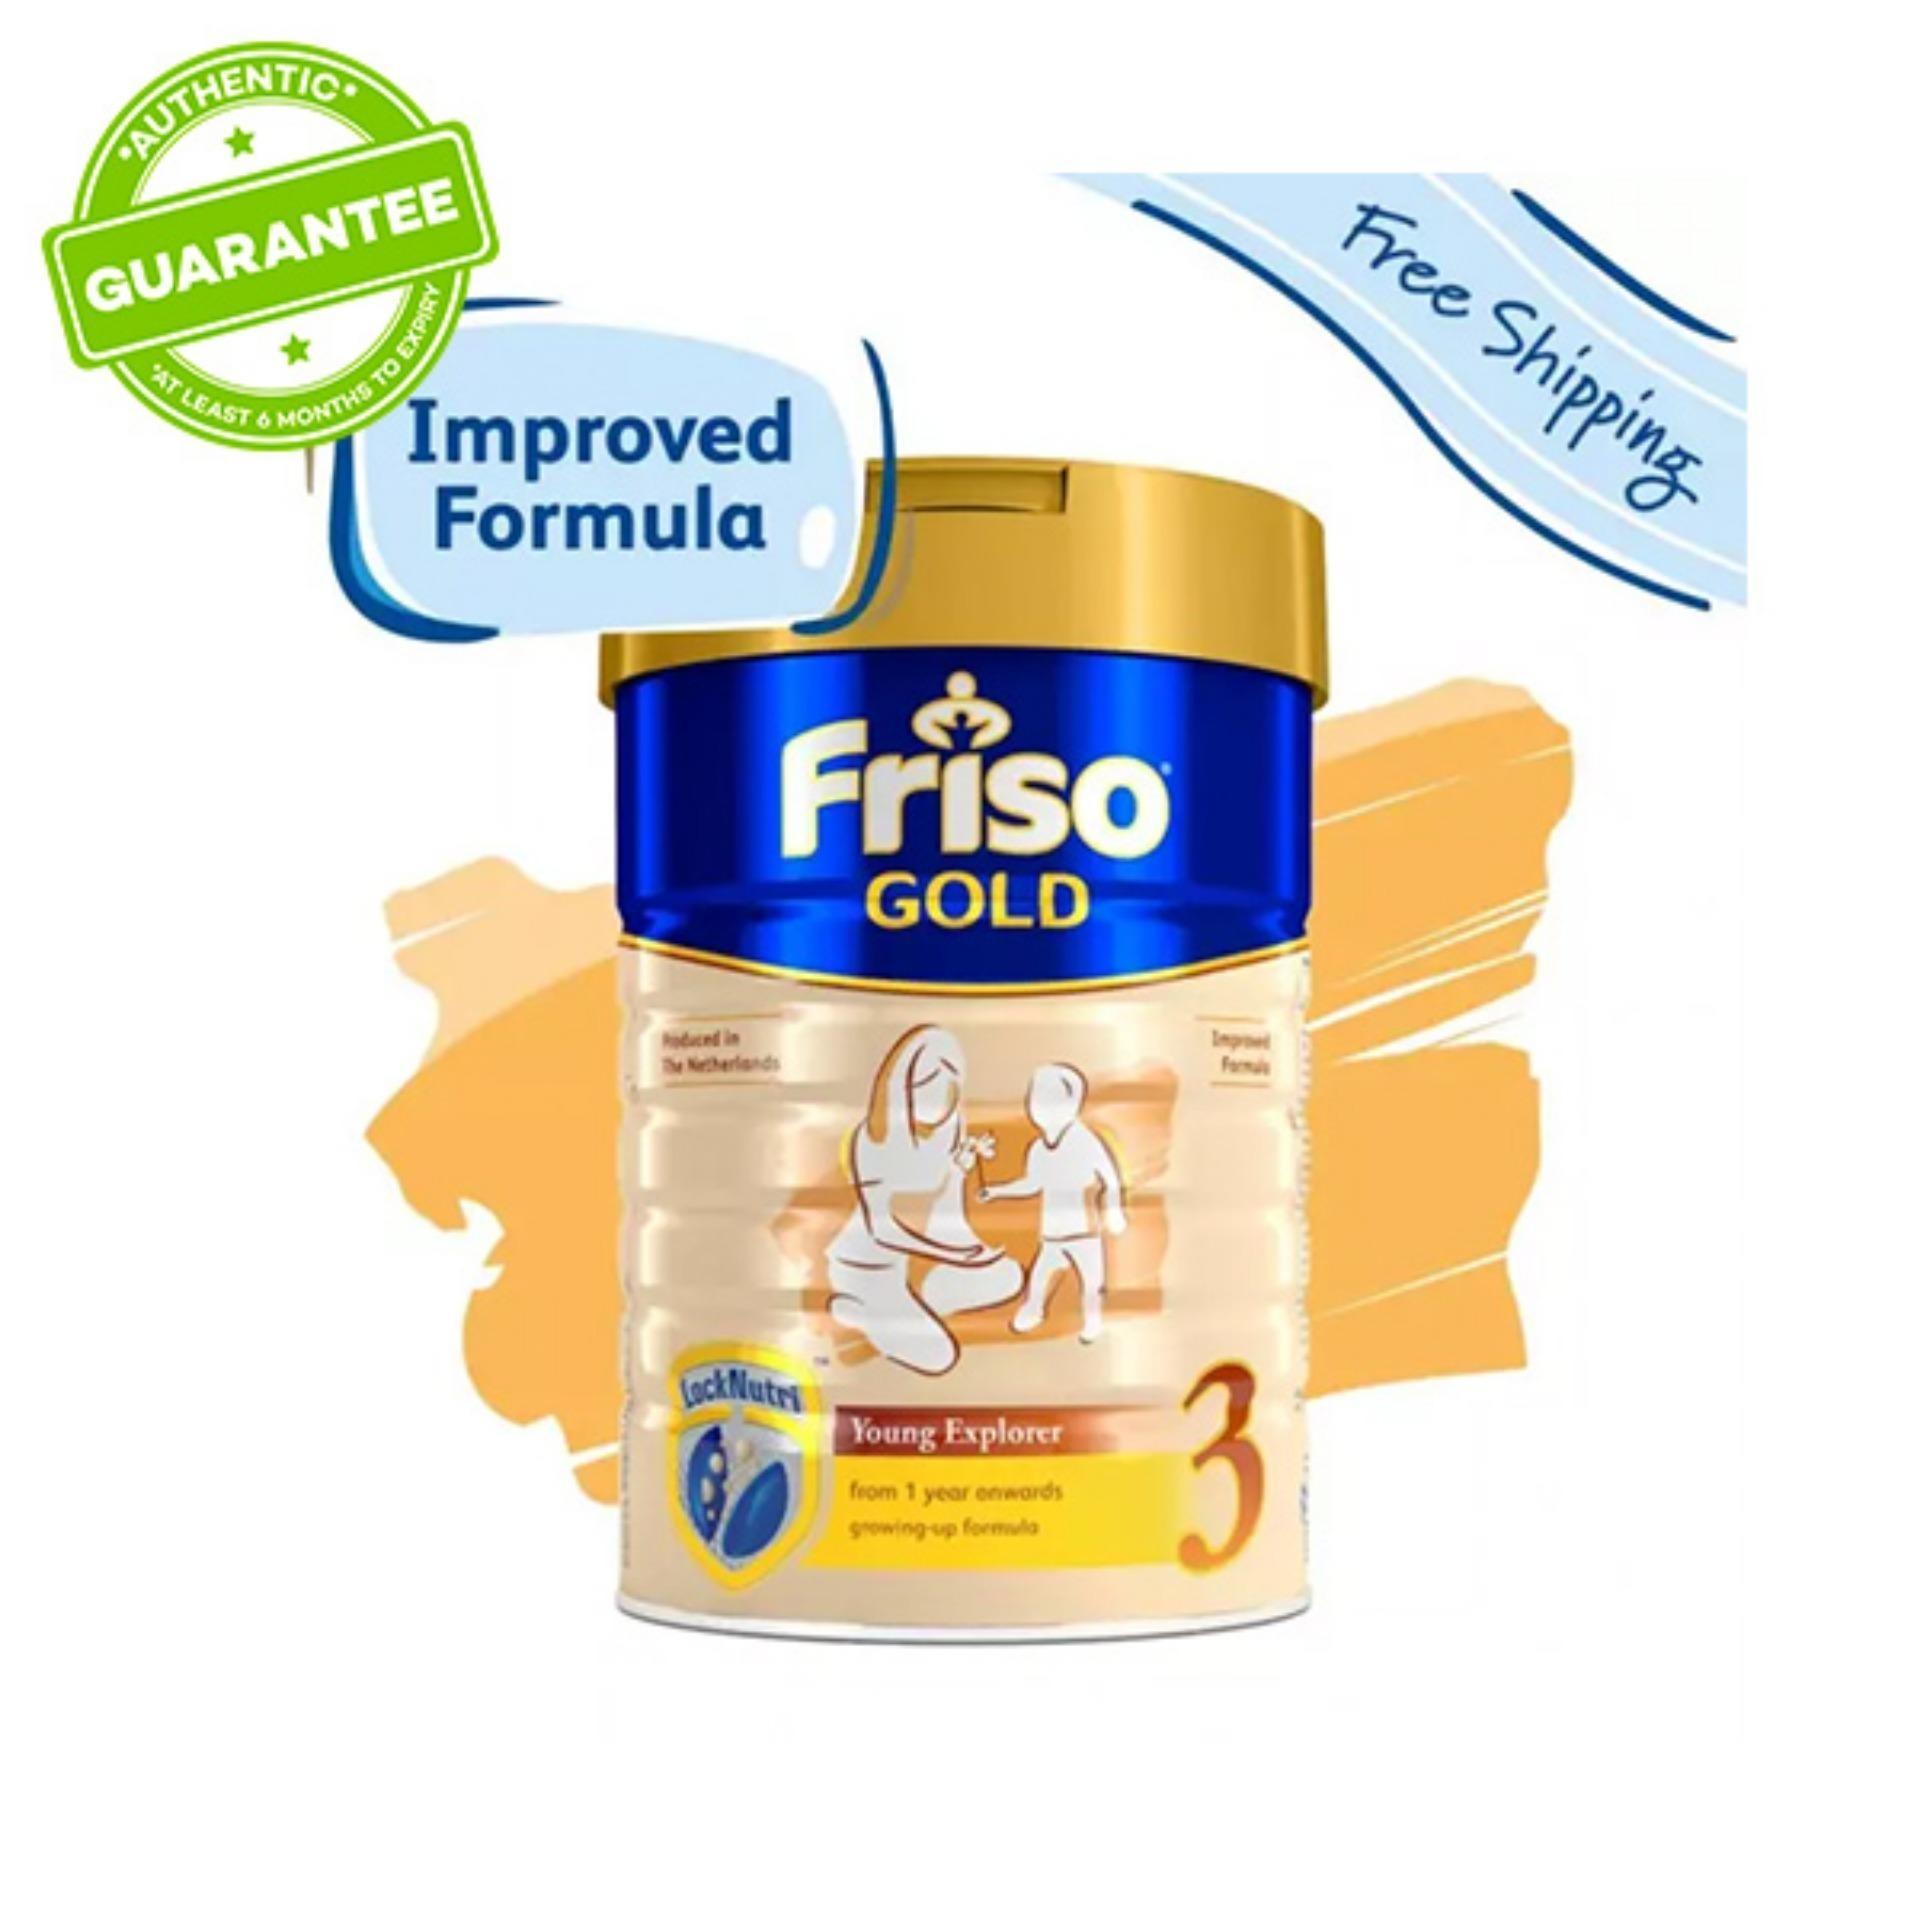 Friso Gold 3 Growing Up Milk 1.8kg x 2 tins